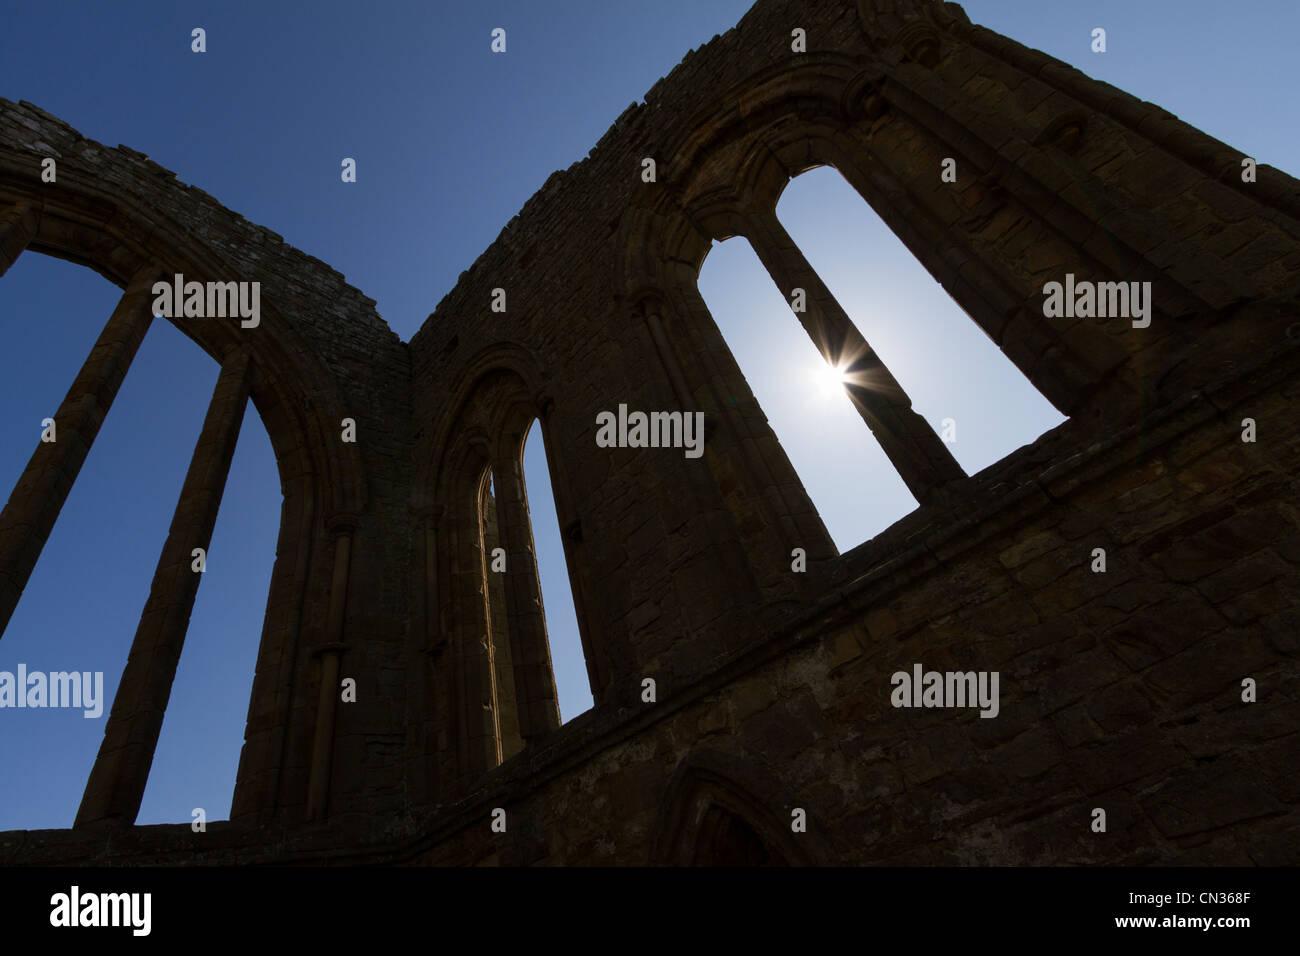 The Premonstratensian abbey of St. John the Baptist at Egglestone near Barnard Castle, Teesdale, County Durham, - Stock Image